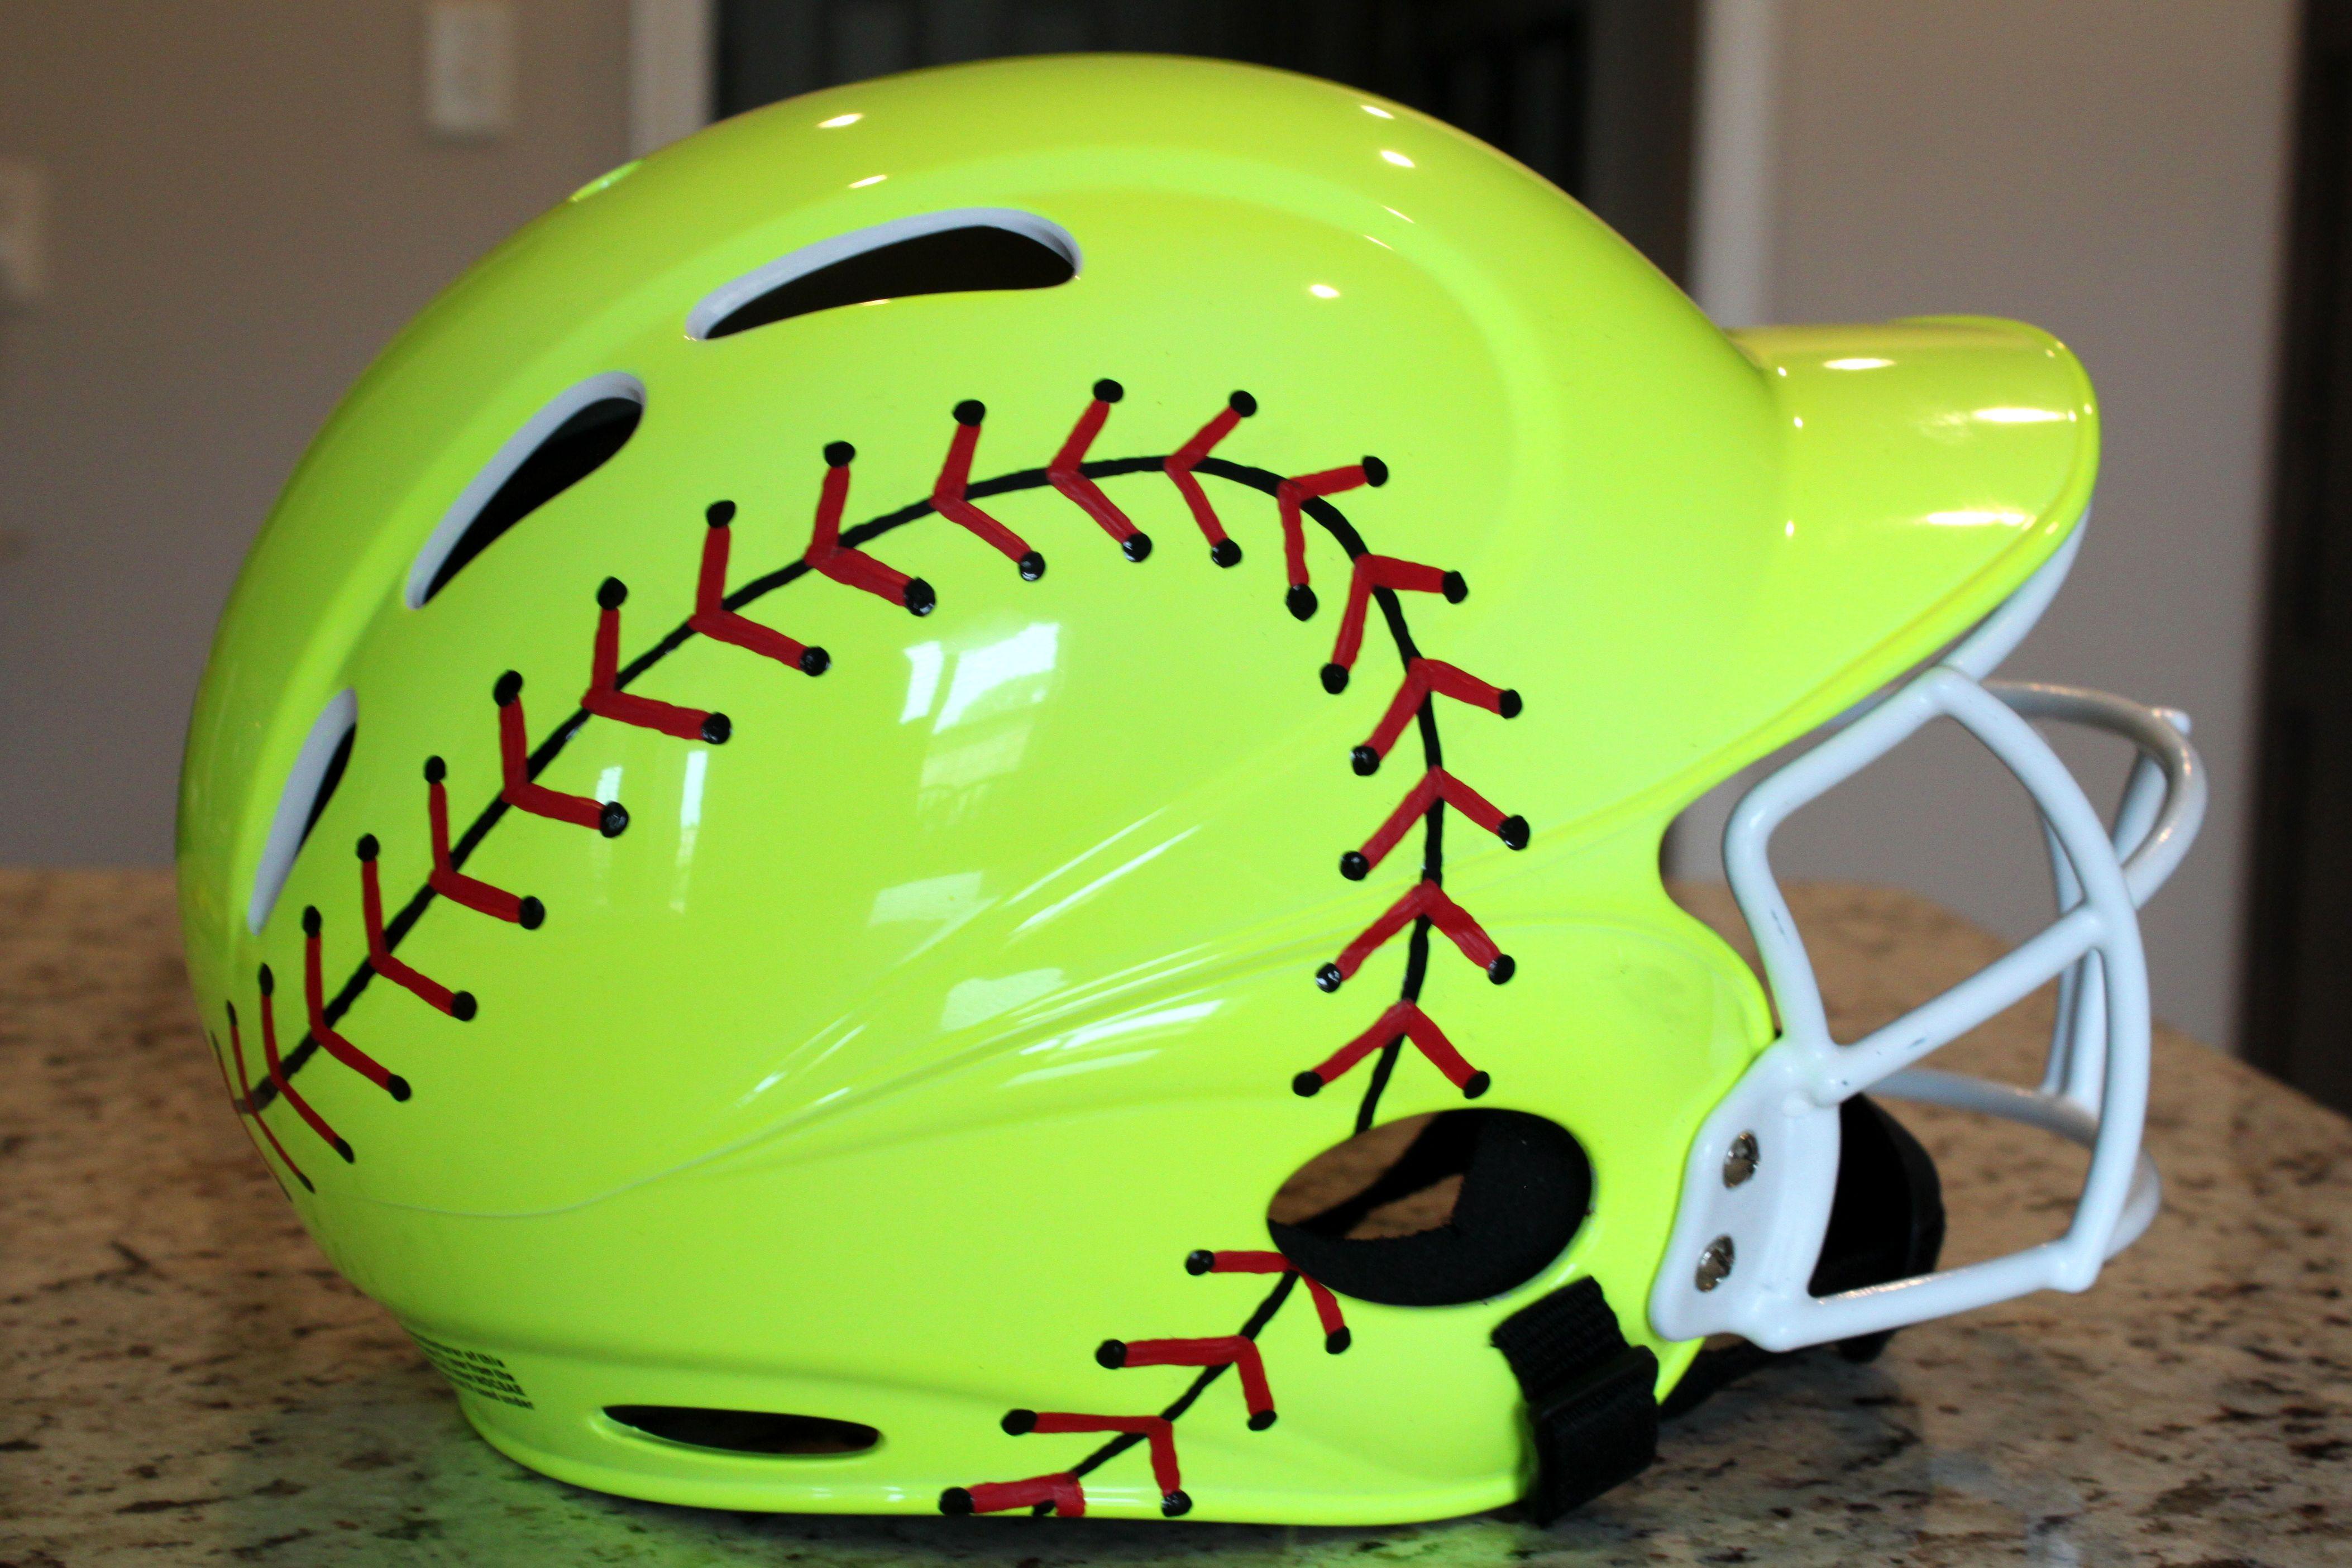 Softball Painted Batting Helmet Love This Not Sure It S Legal In Our League Softball Helmet Softball Gear Softball Crafts